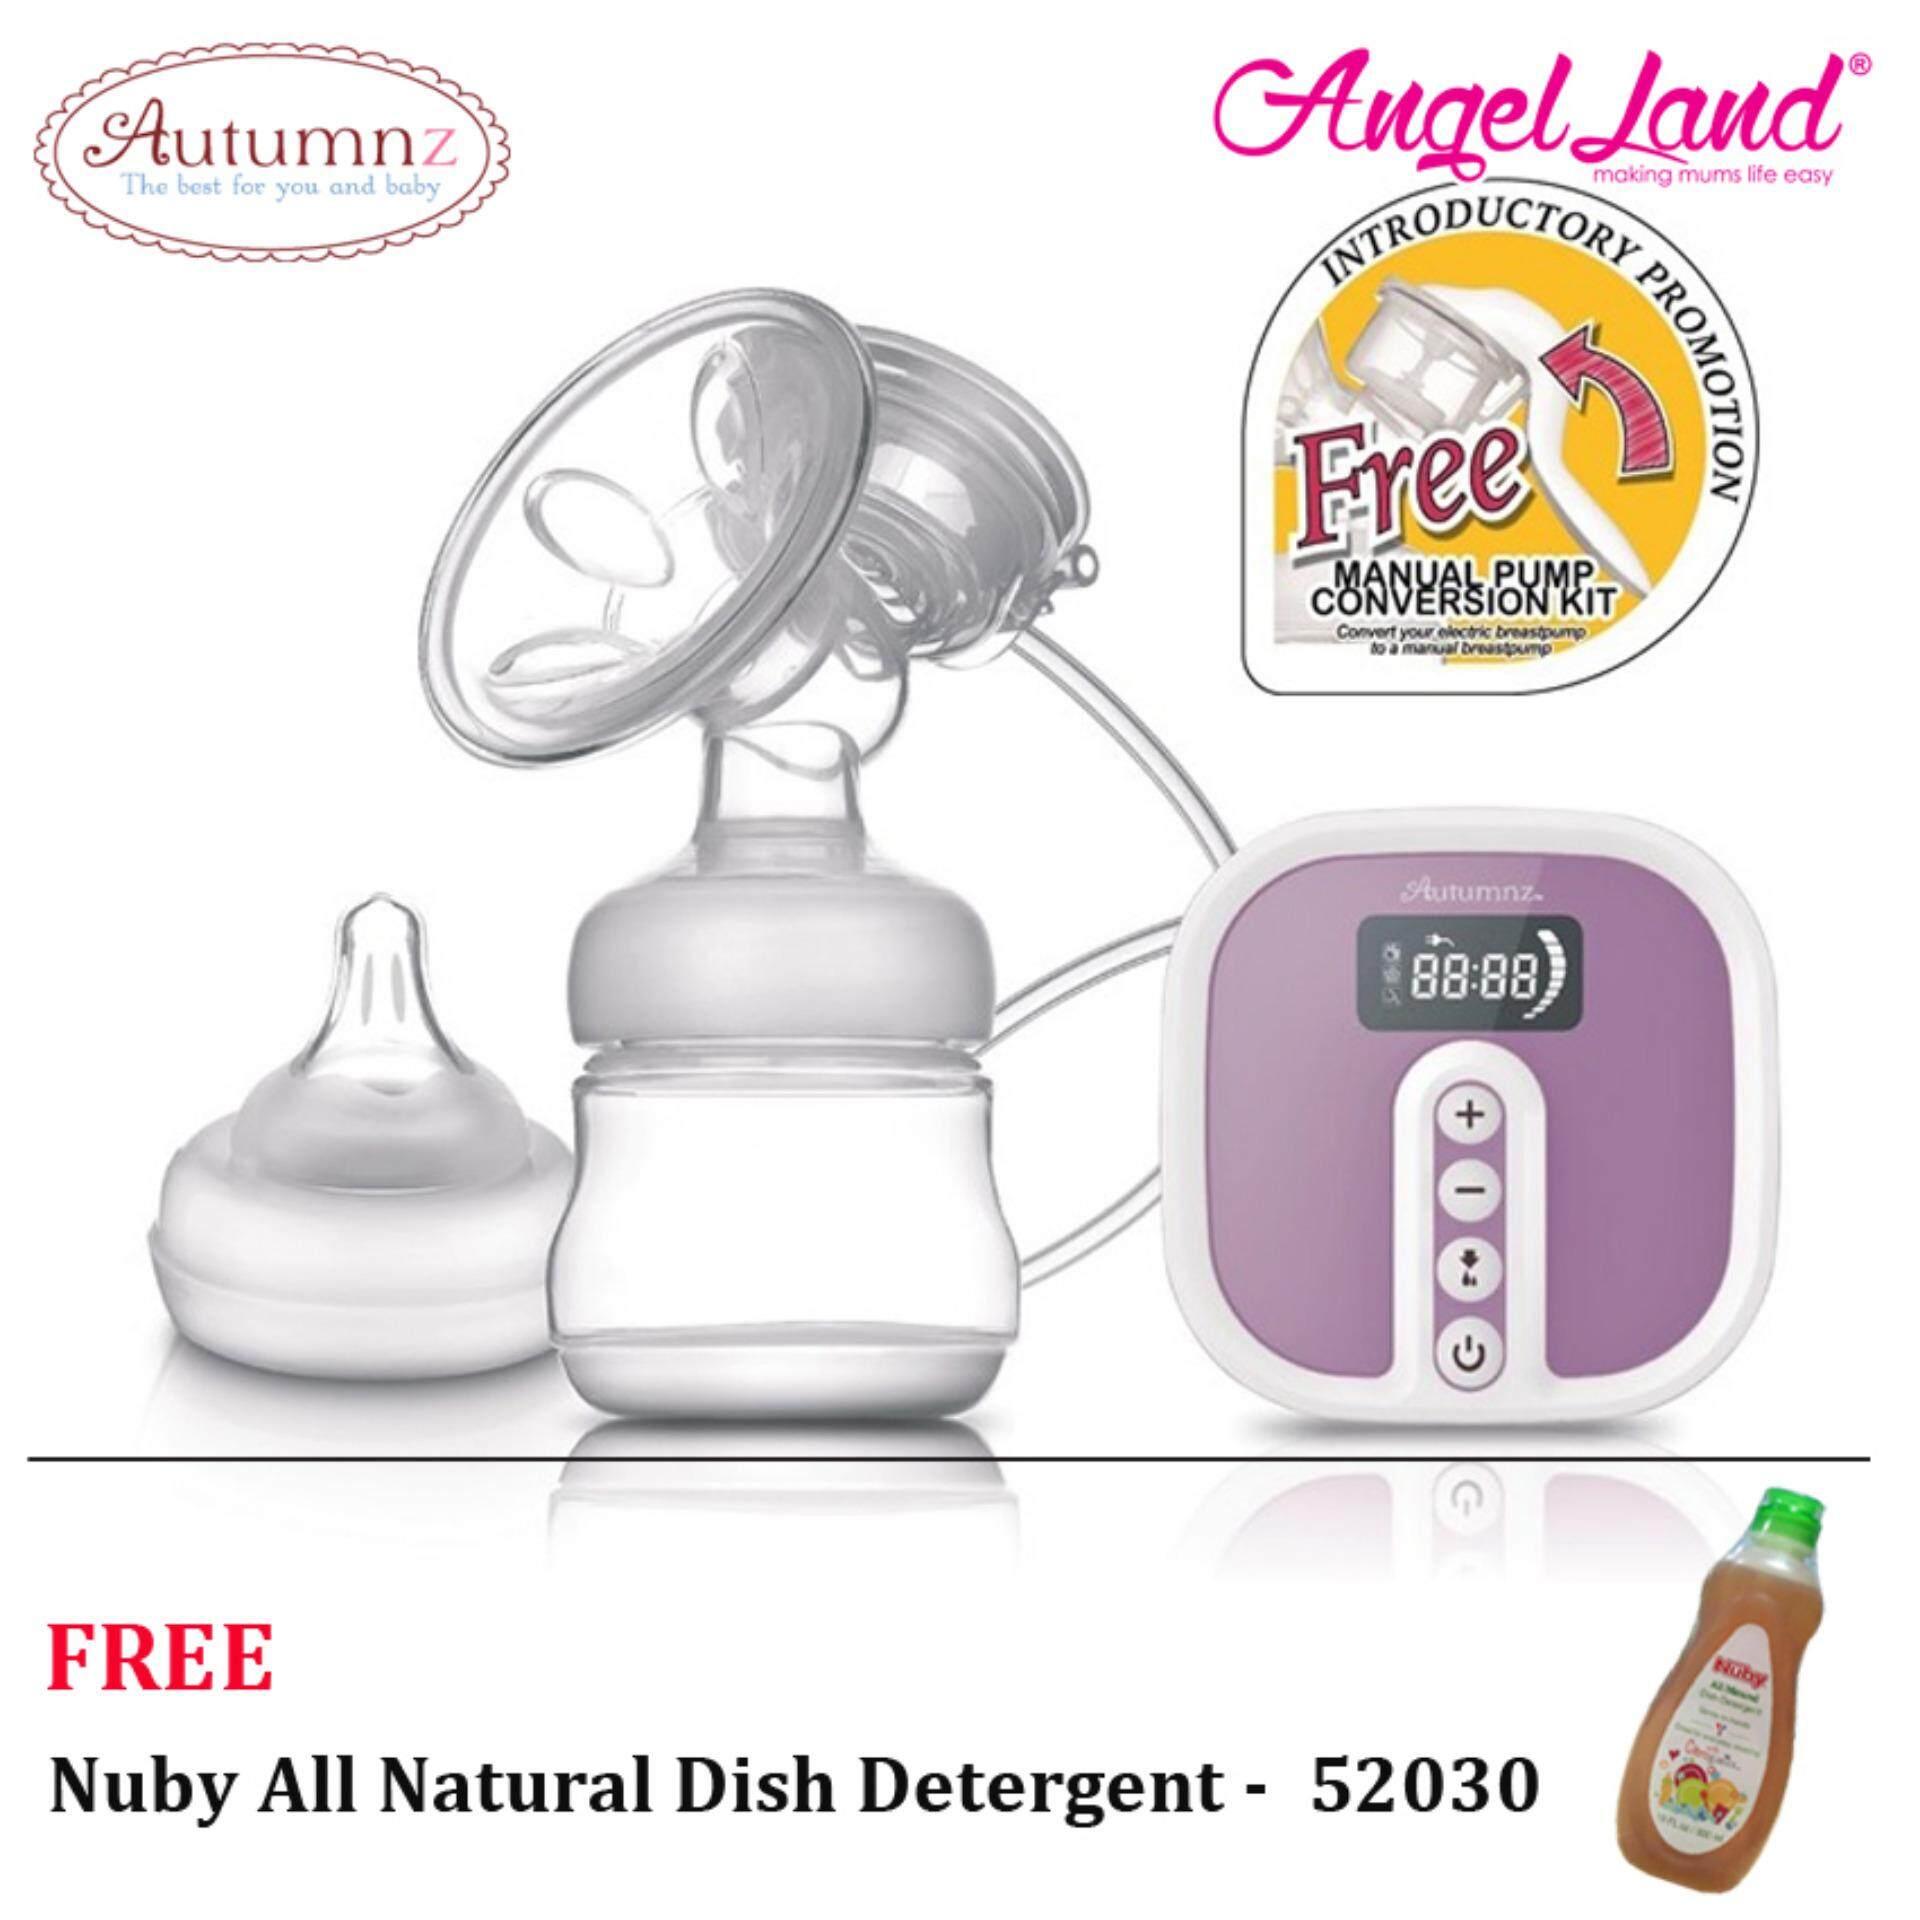 Autumnz - BLOSSOM Convertible Single Electric/Manual Breastpump SiEBP8815 + FOC Nuby All Natural Dish Detergent -  52030